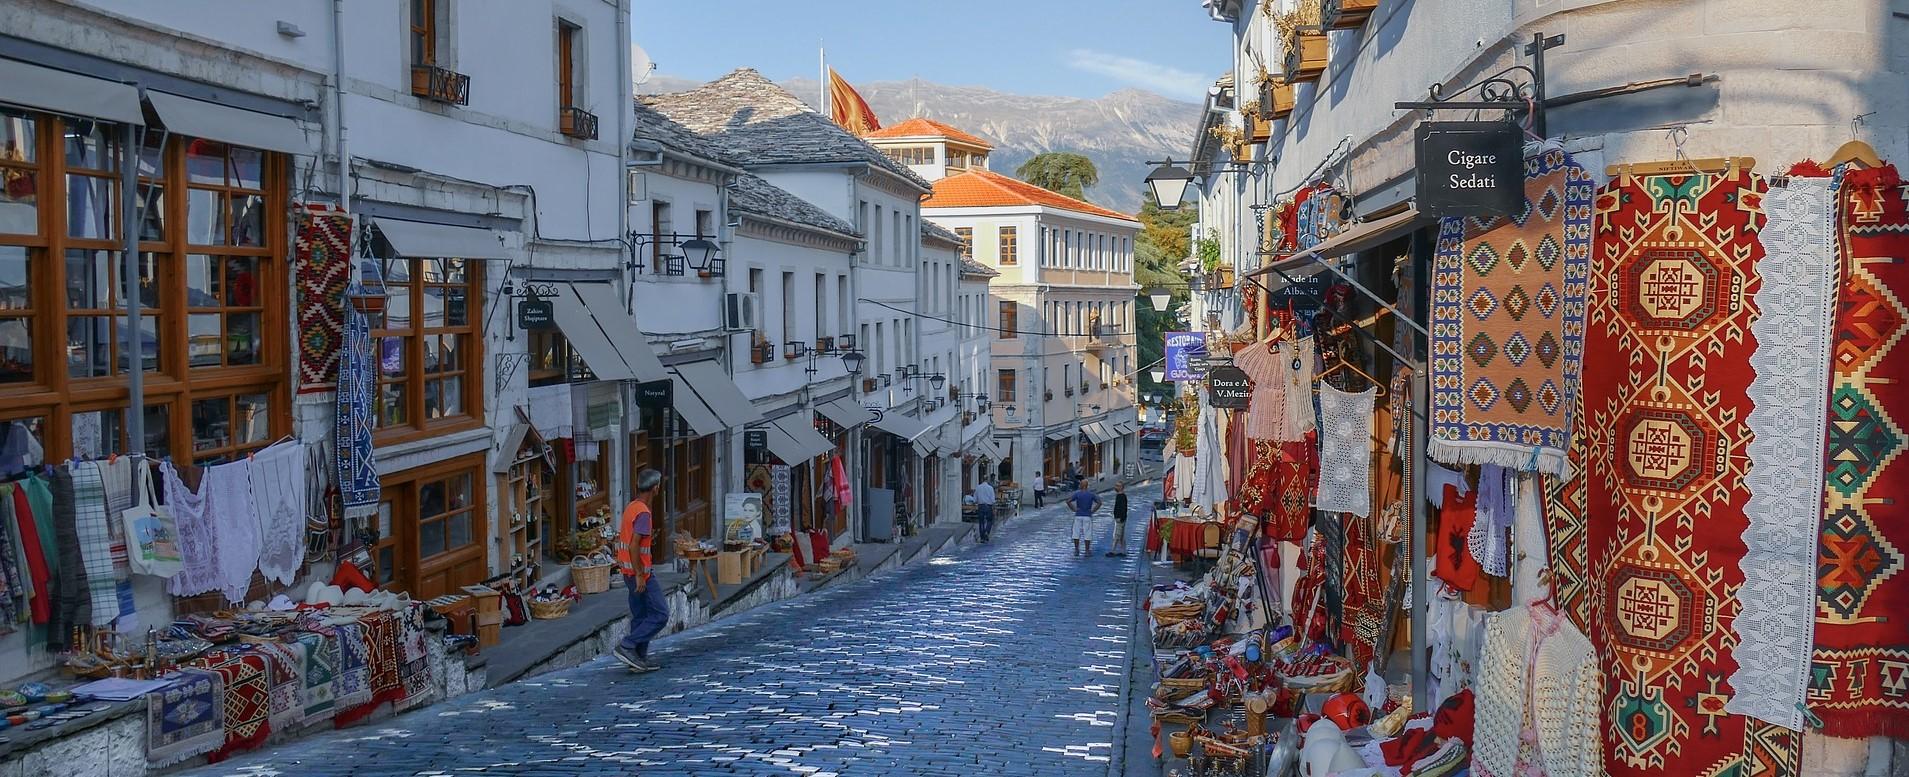 Albania, Kosovo, and North Macedonia – 2020